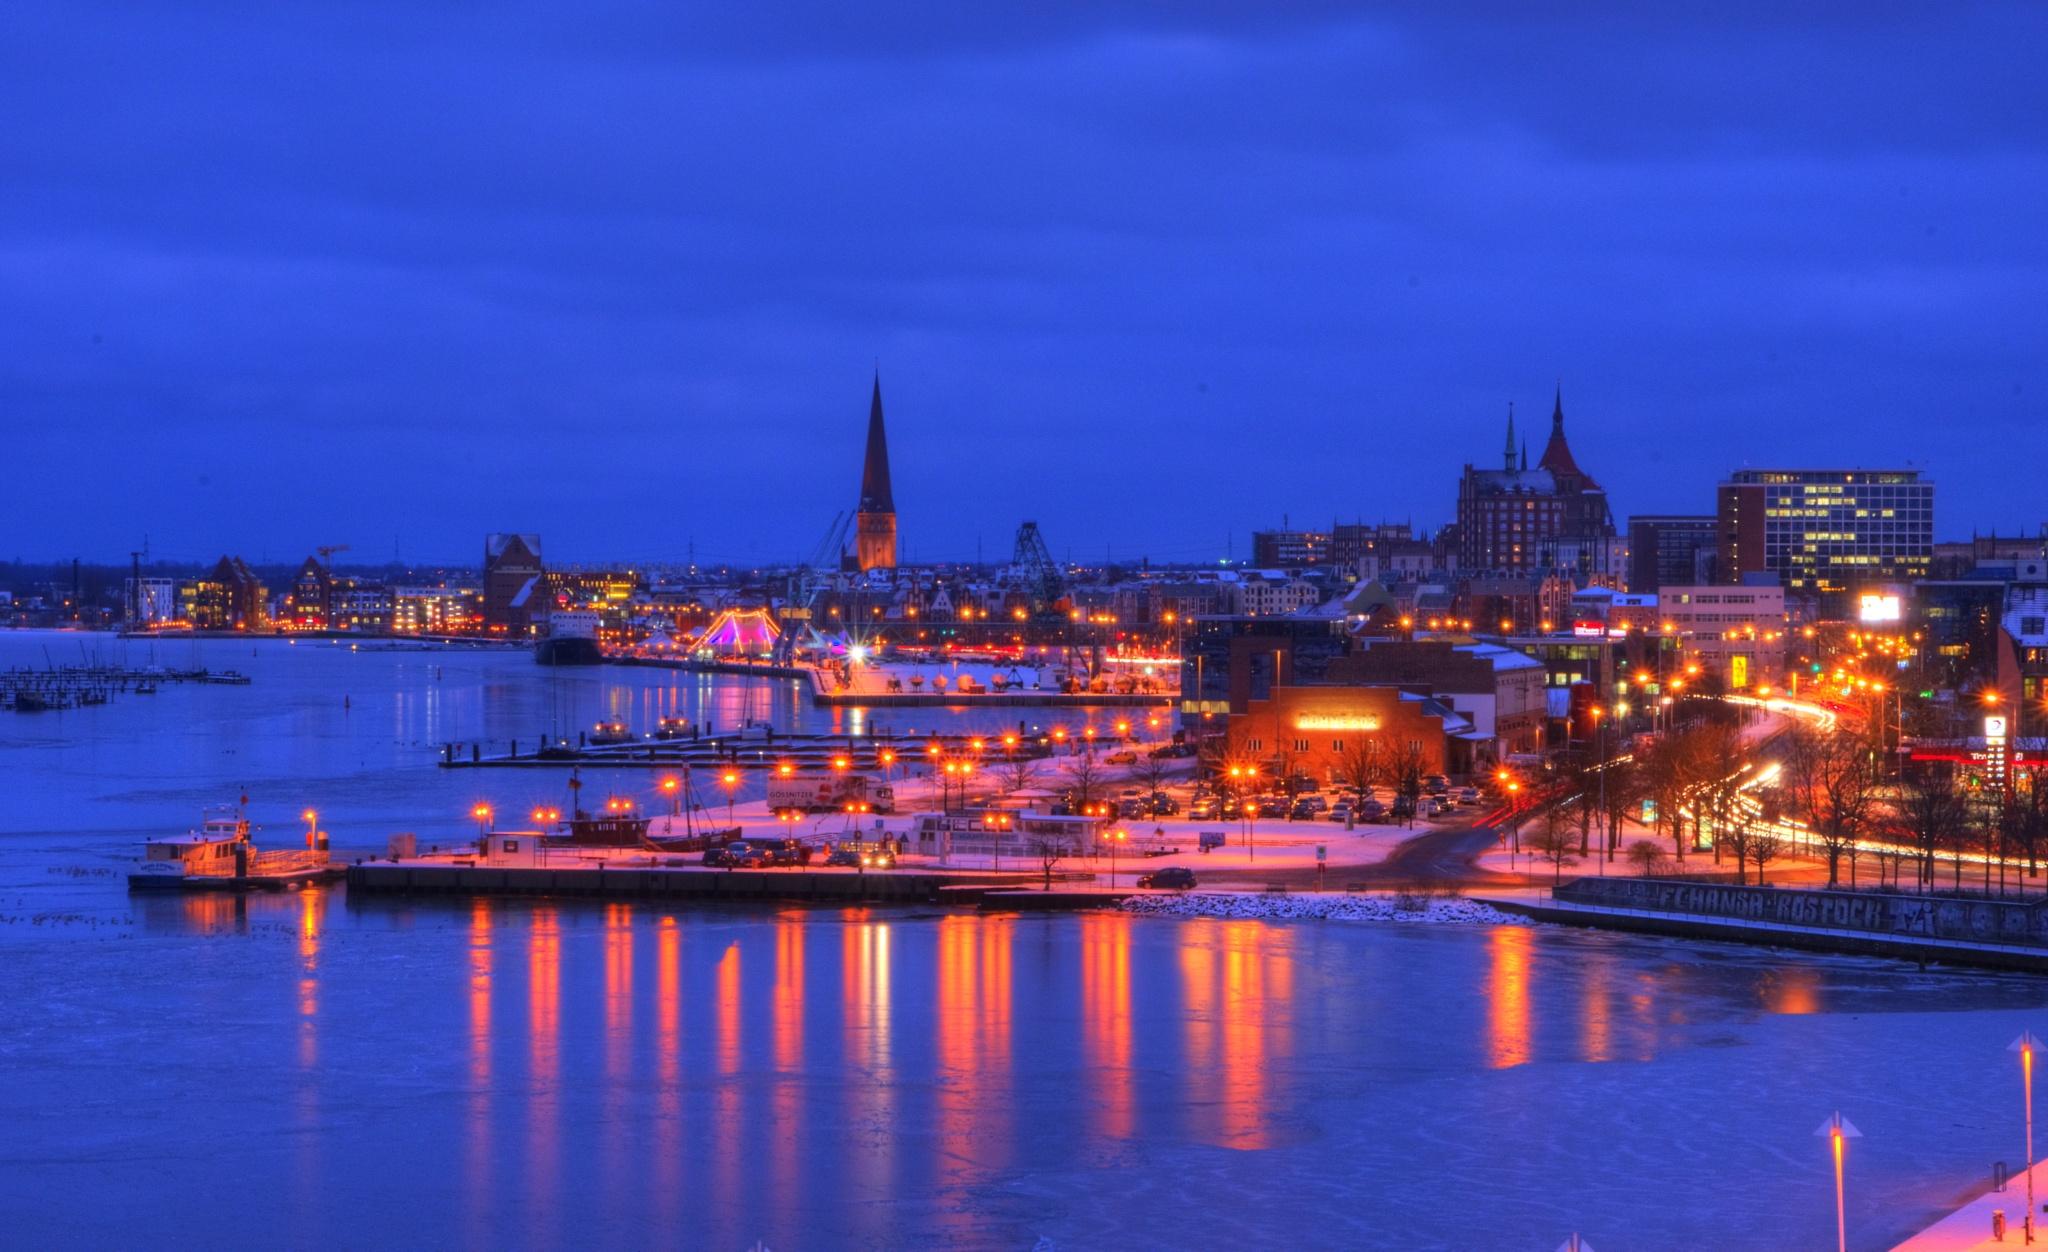 Rostock Cityport Blue Hour by diplompunk